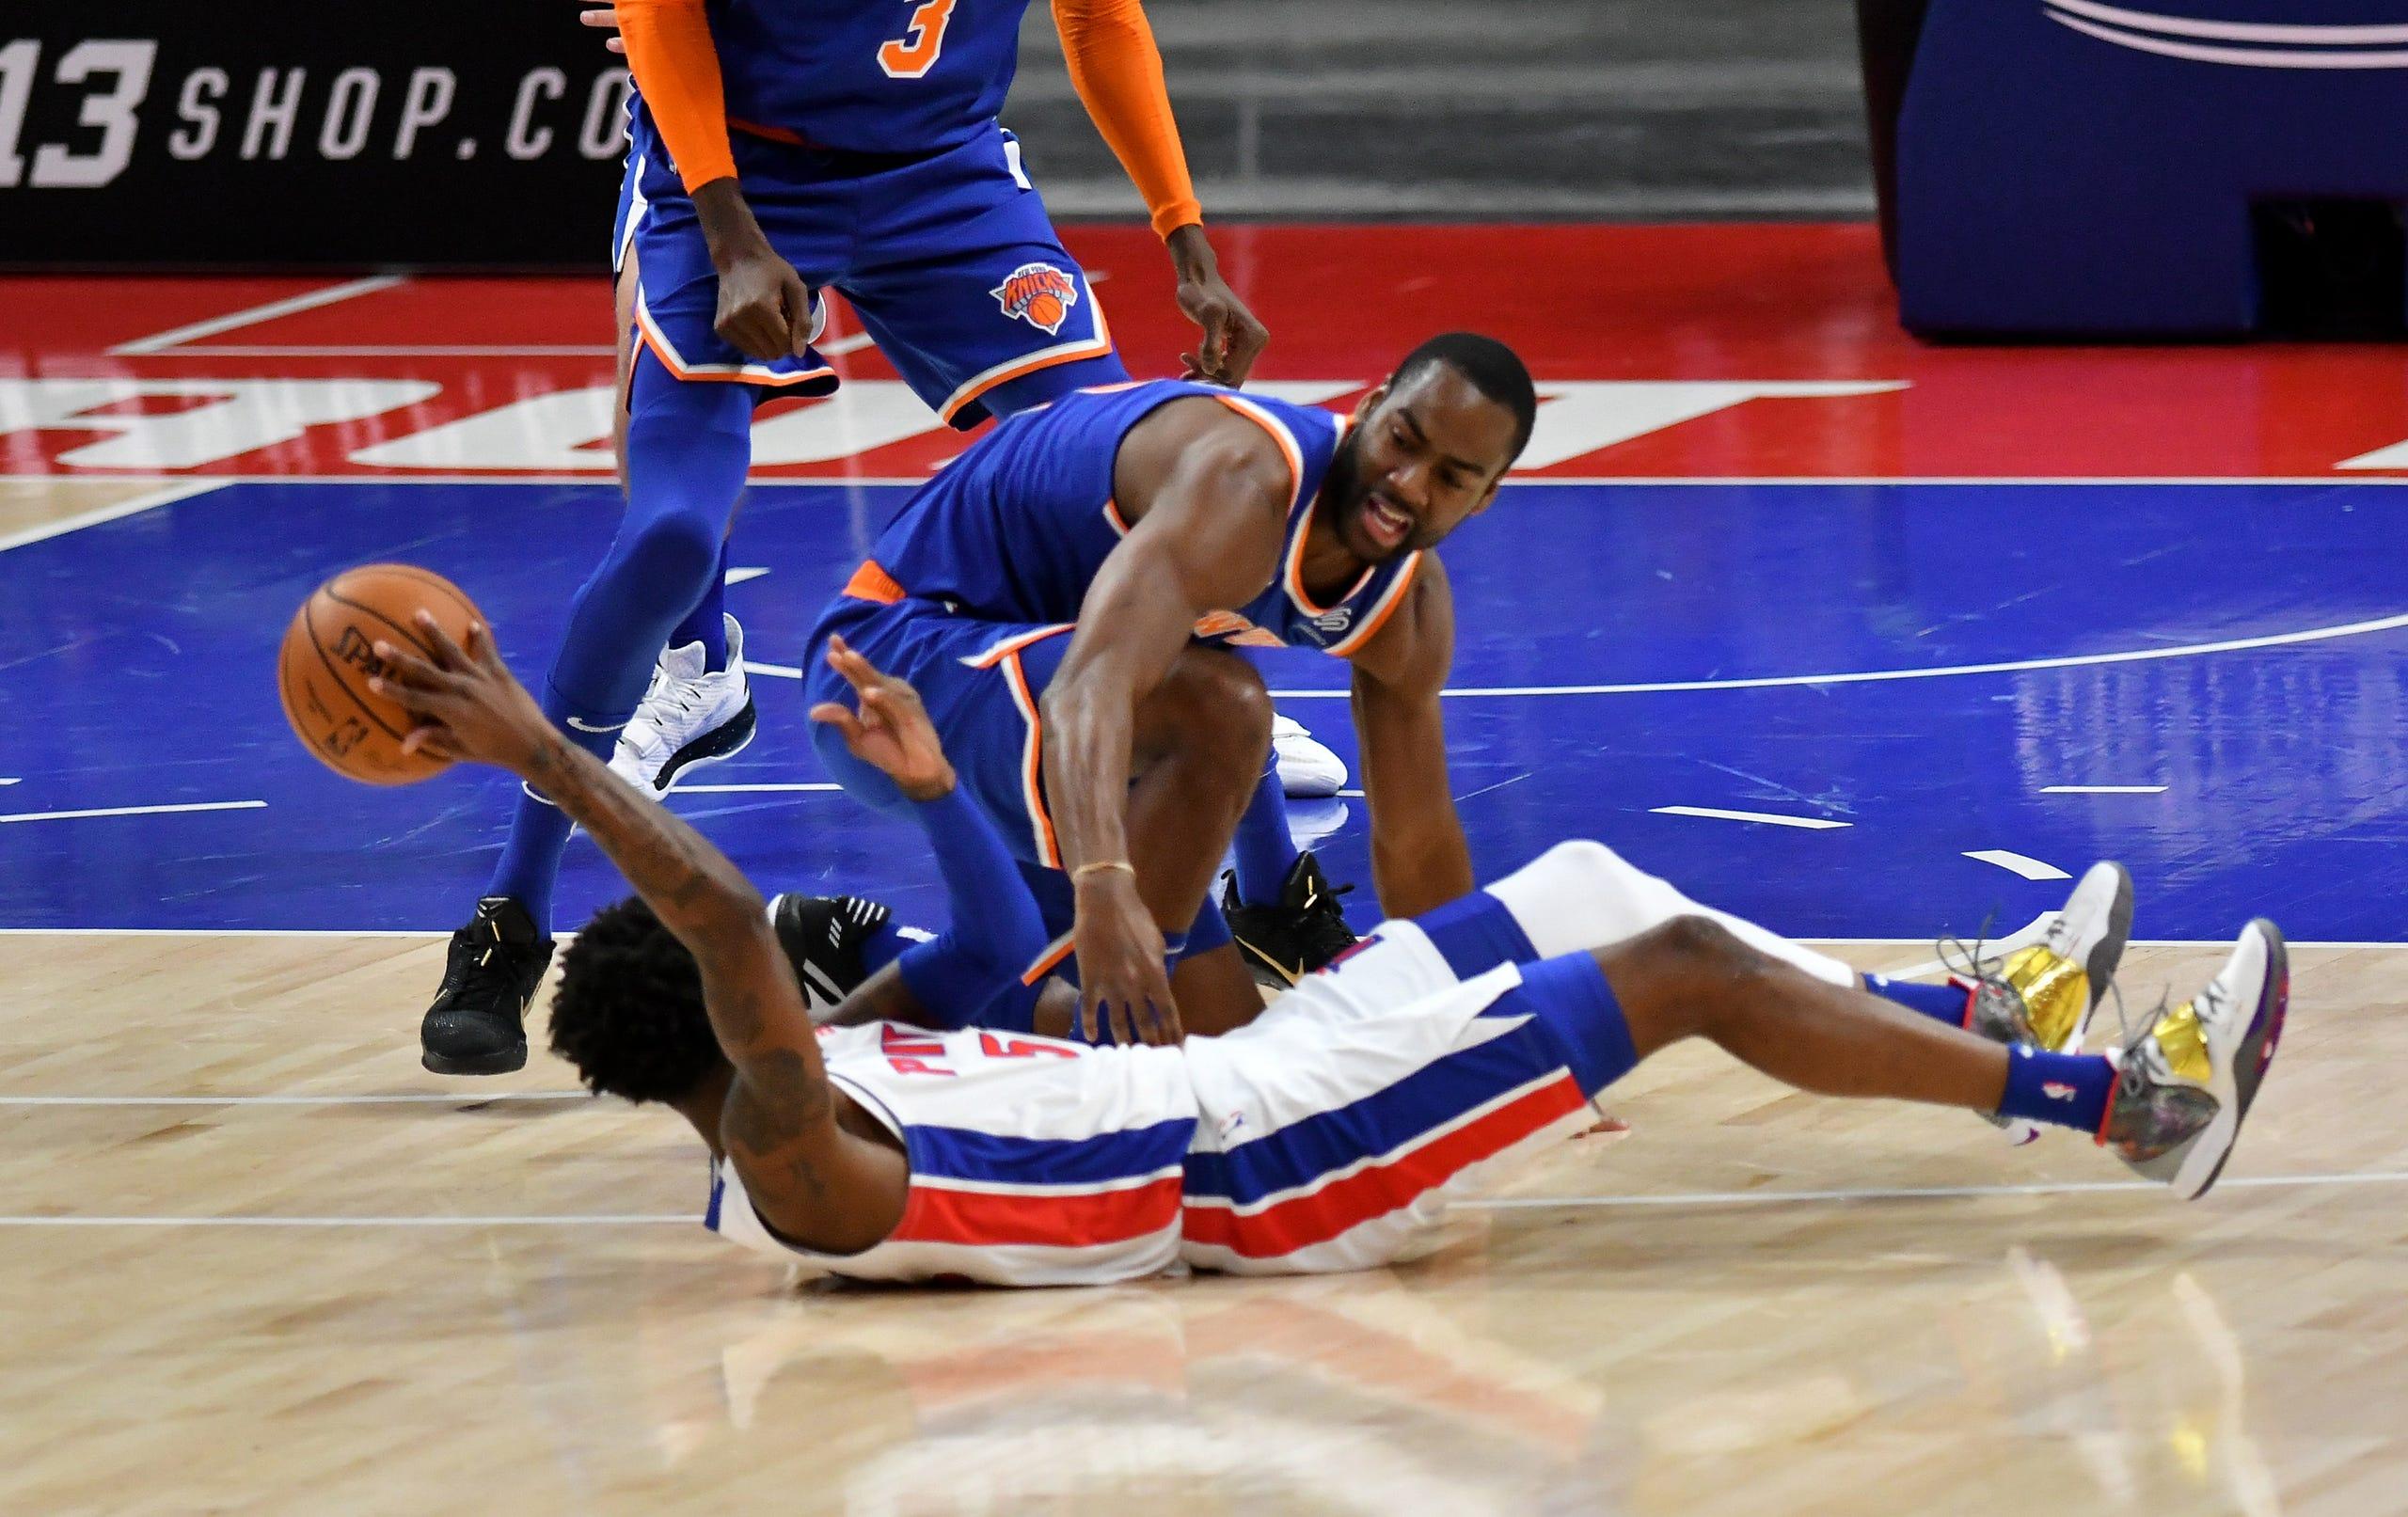 Exhibition: Knicks 90, Pistons 84